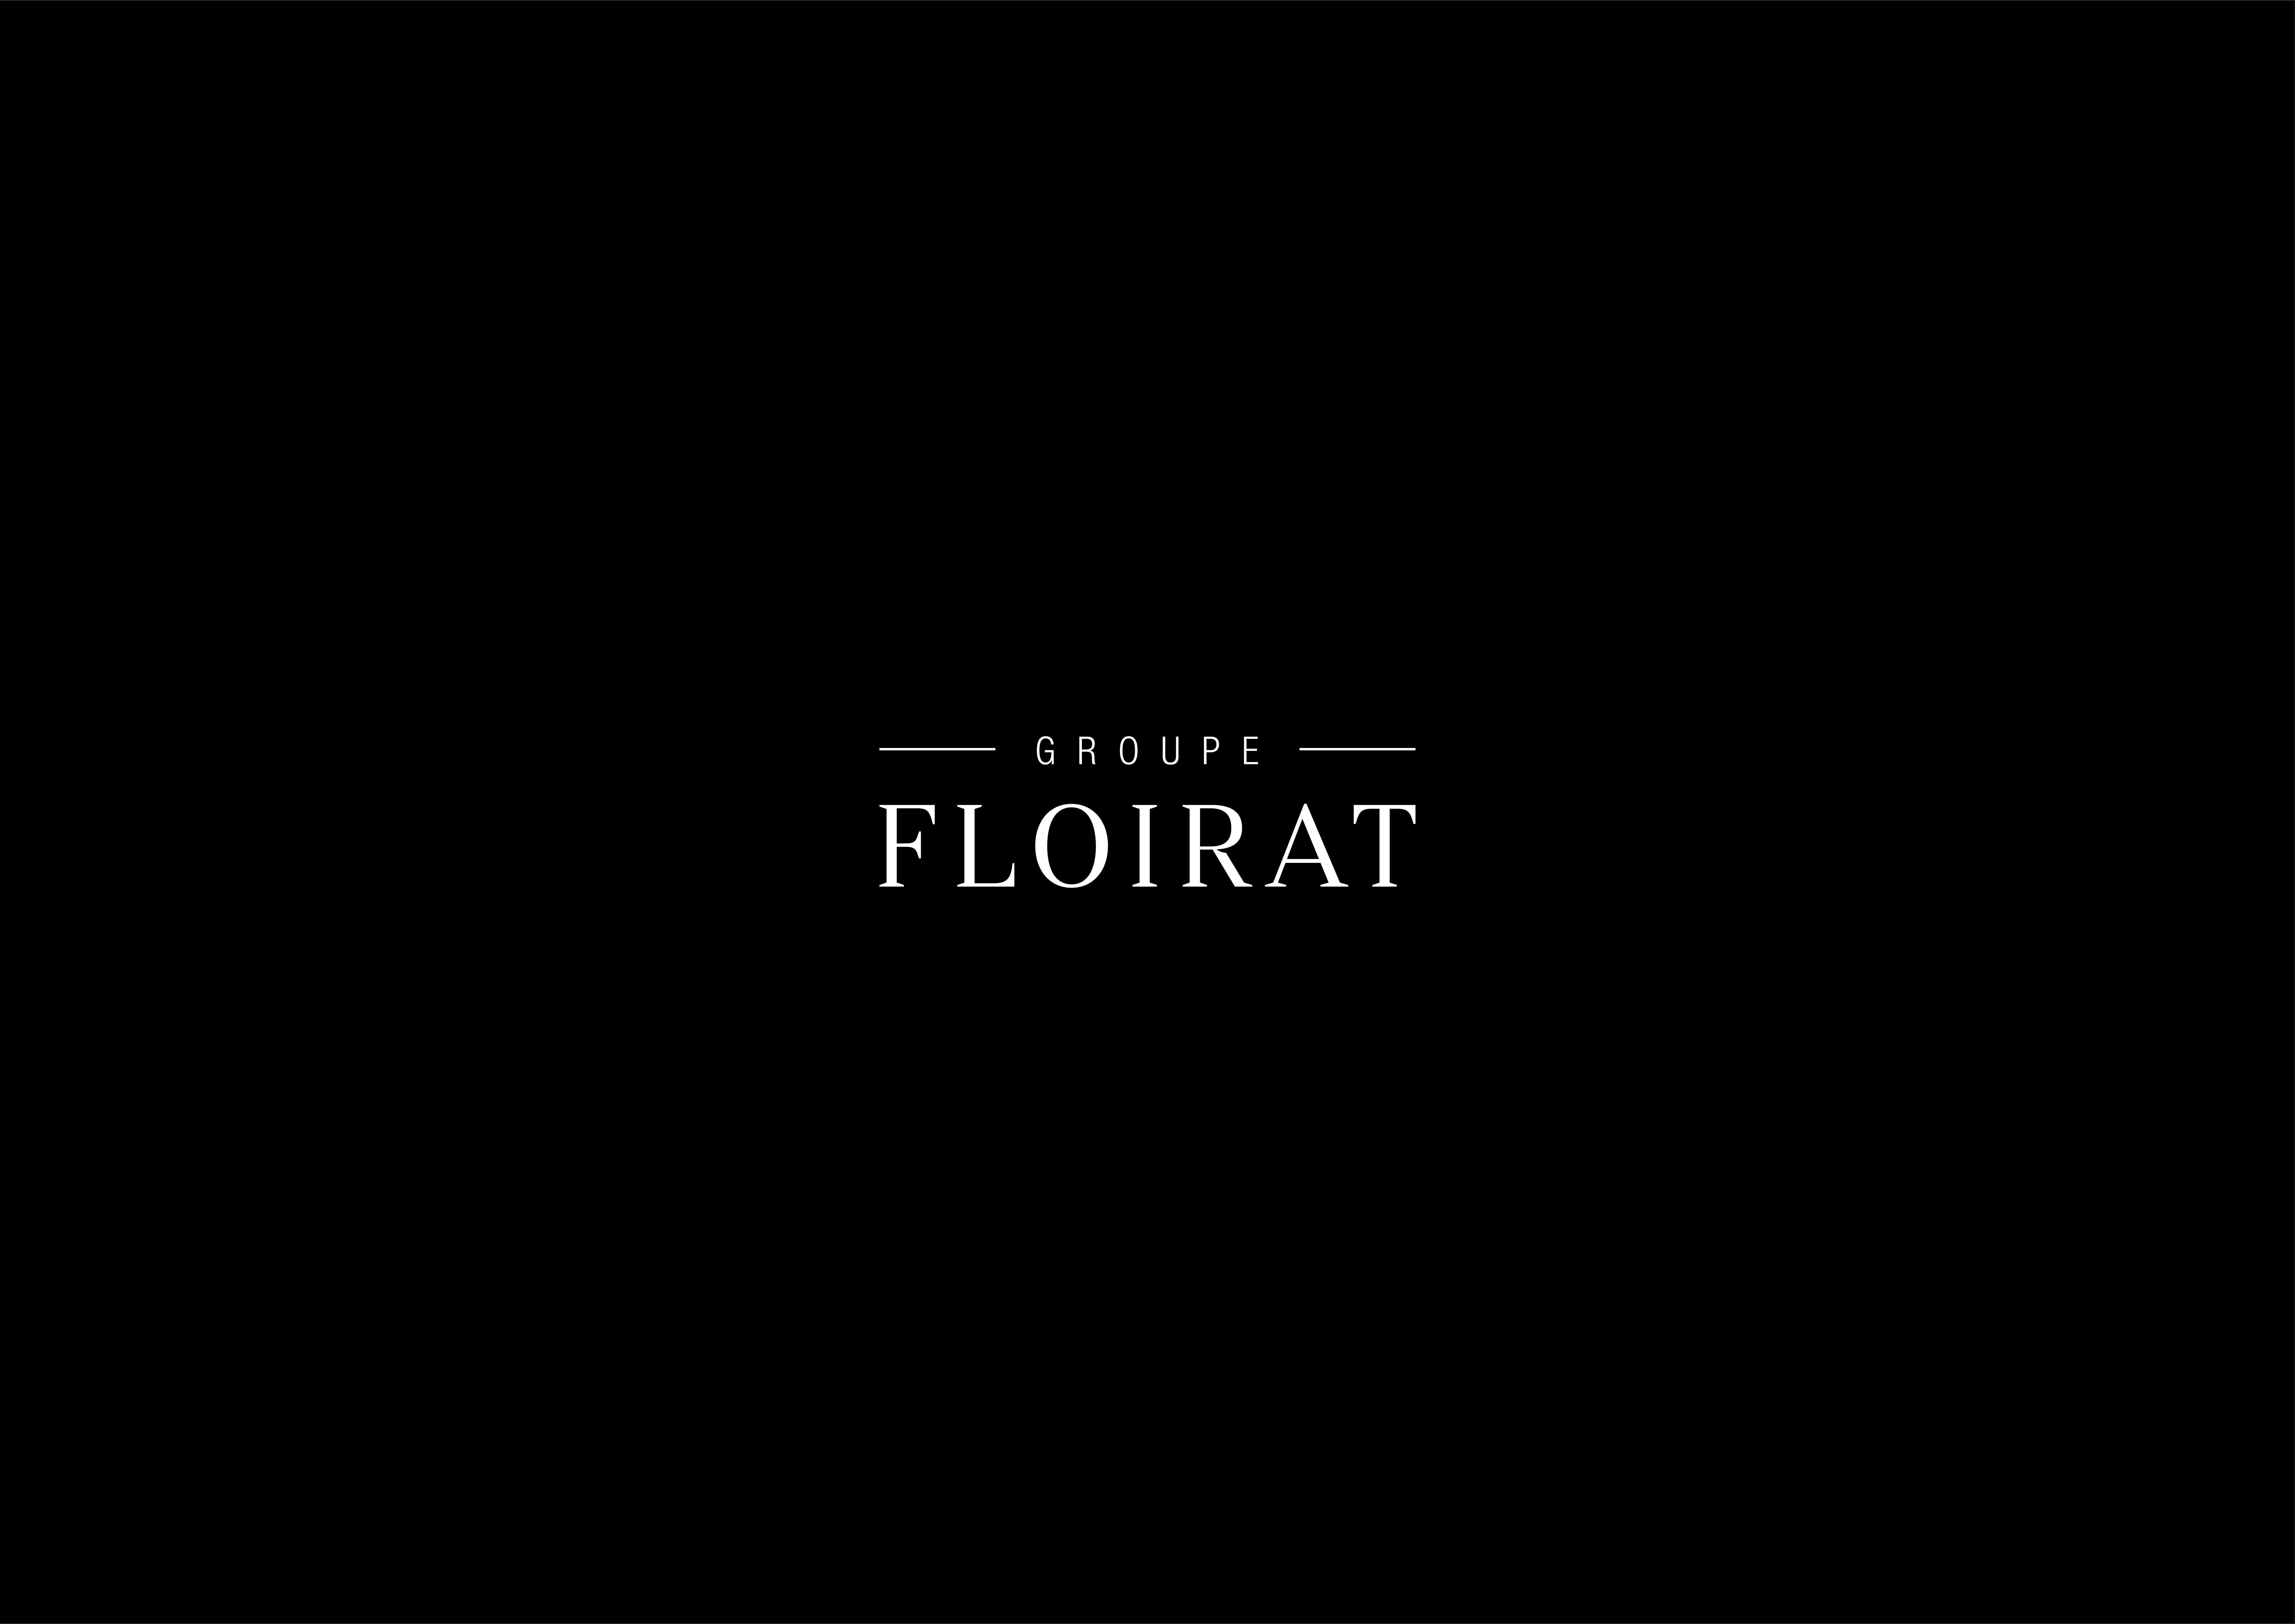 logo groupe floirat hotellerie